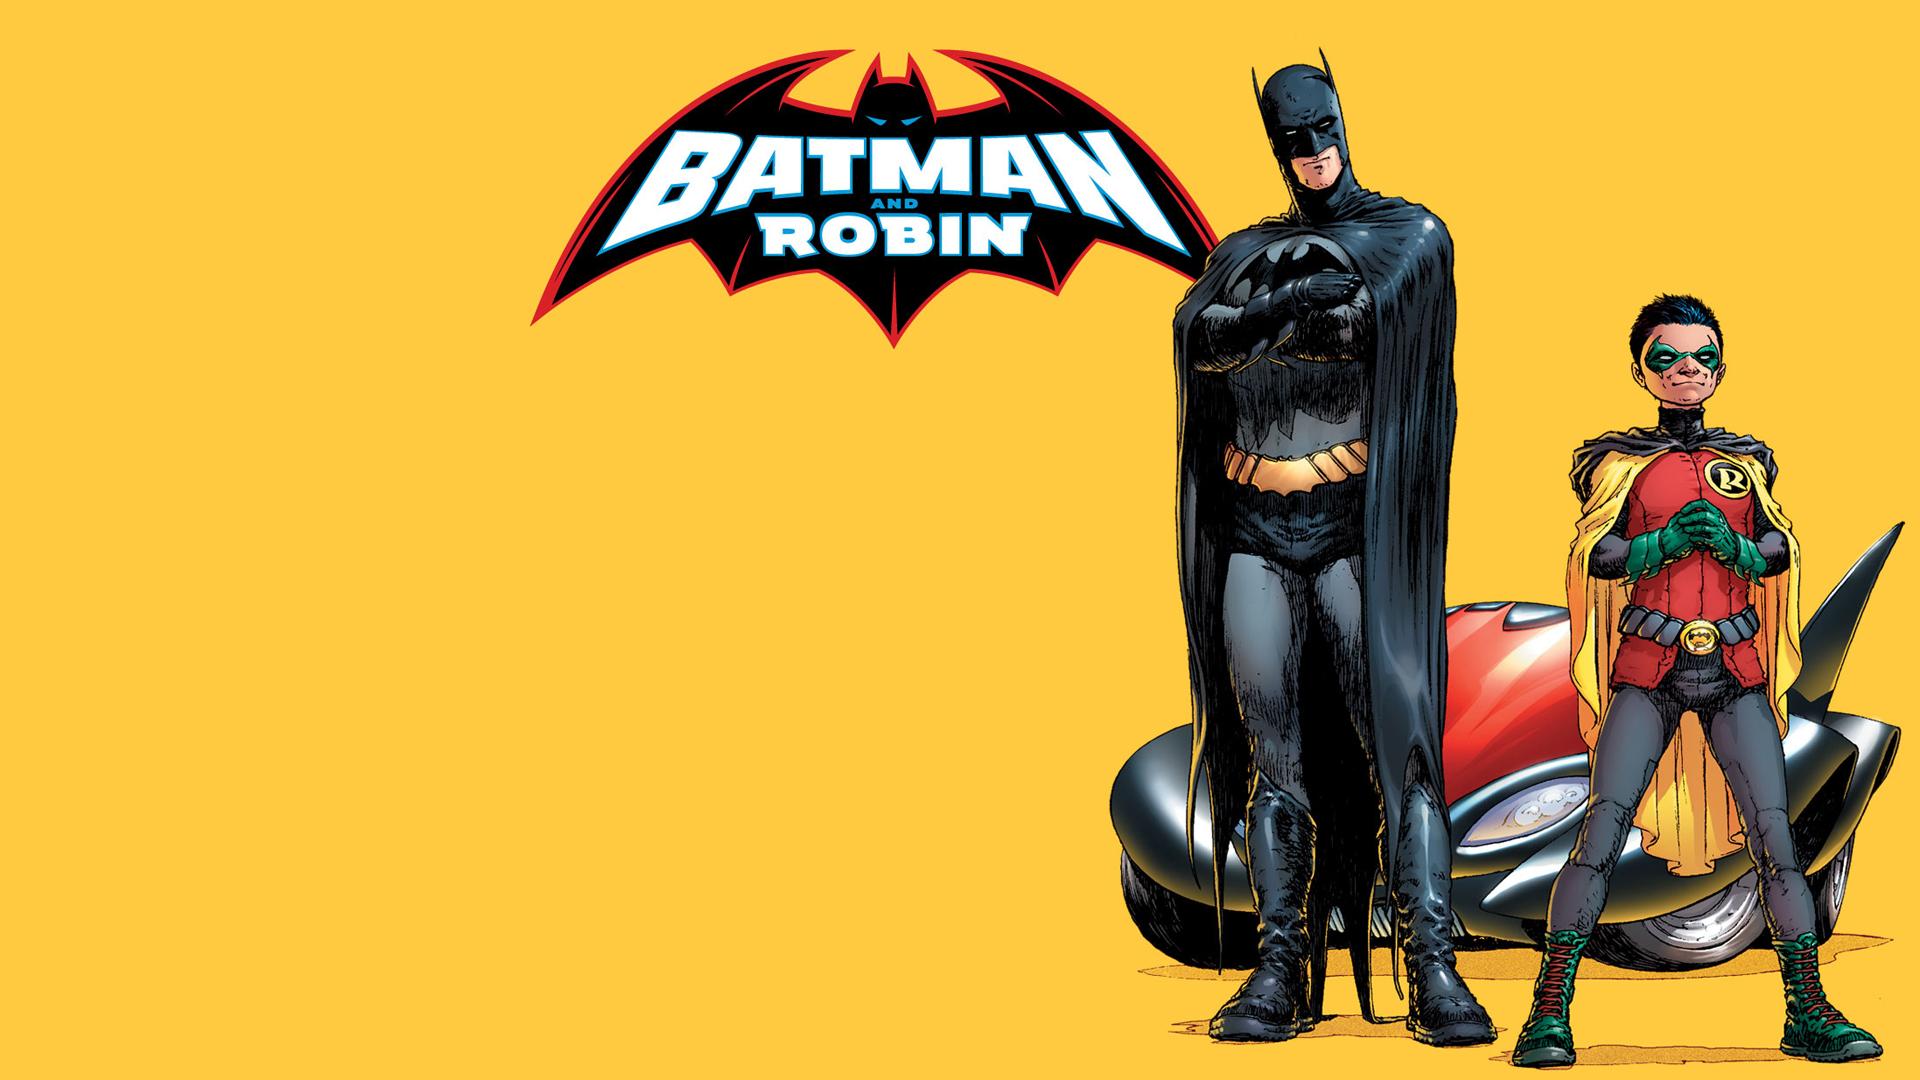 Batman Robin HD Wallpaper